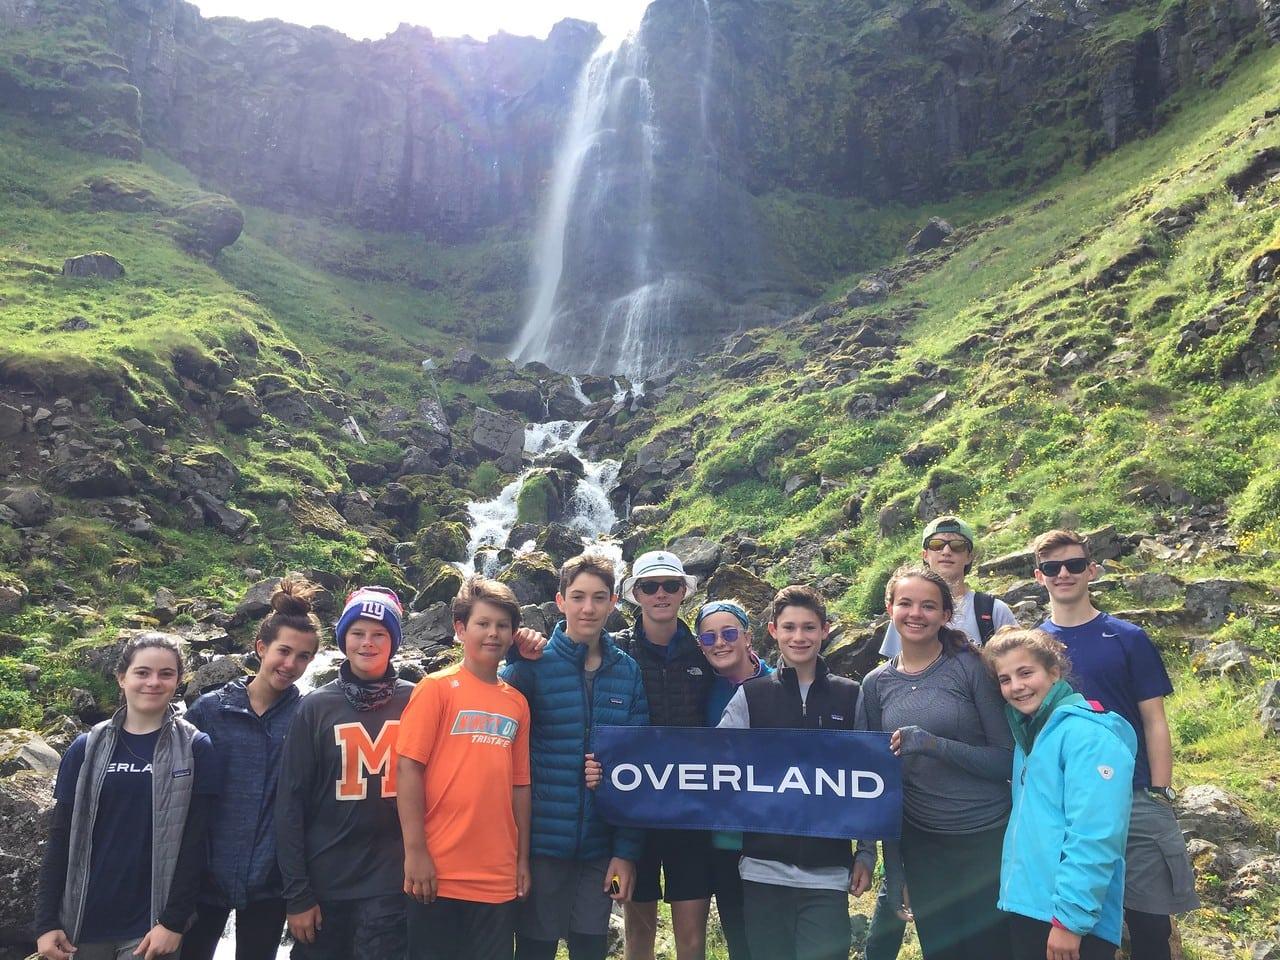 Teen Summer Hiking Trip Iceland Explorer 10